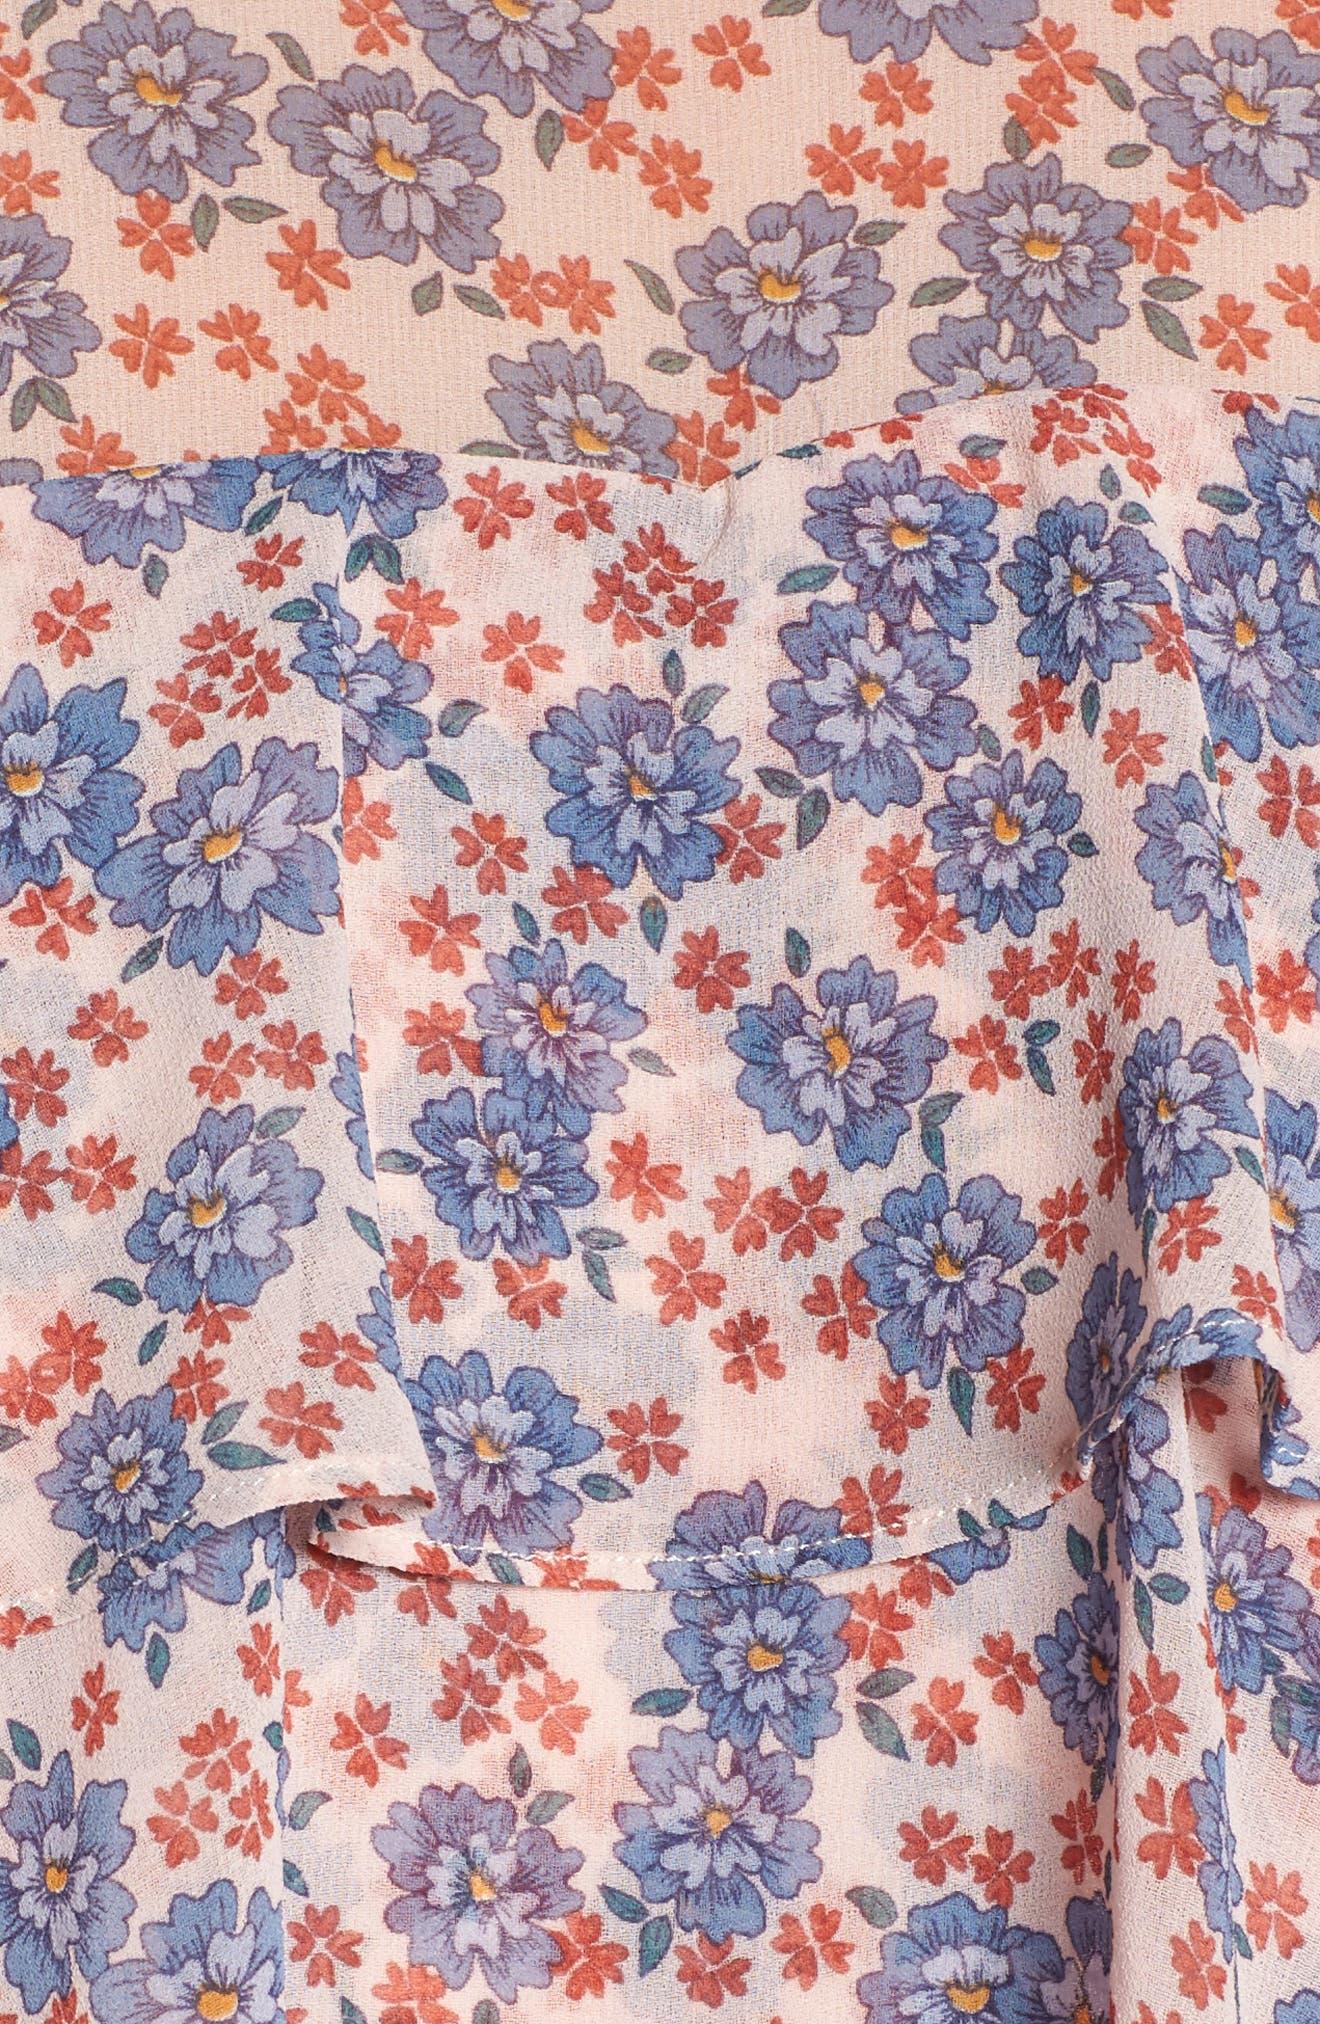 Darcy Ruffle Dress,                             Alternate thumbnail 5, color,                             Pink Multi